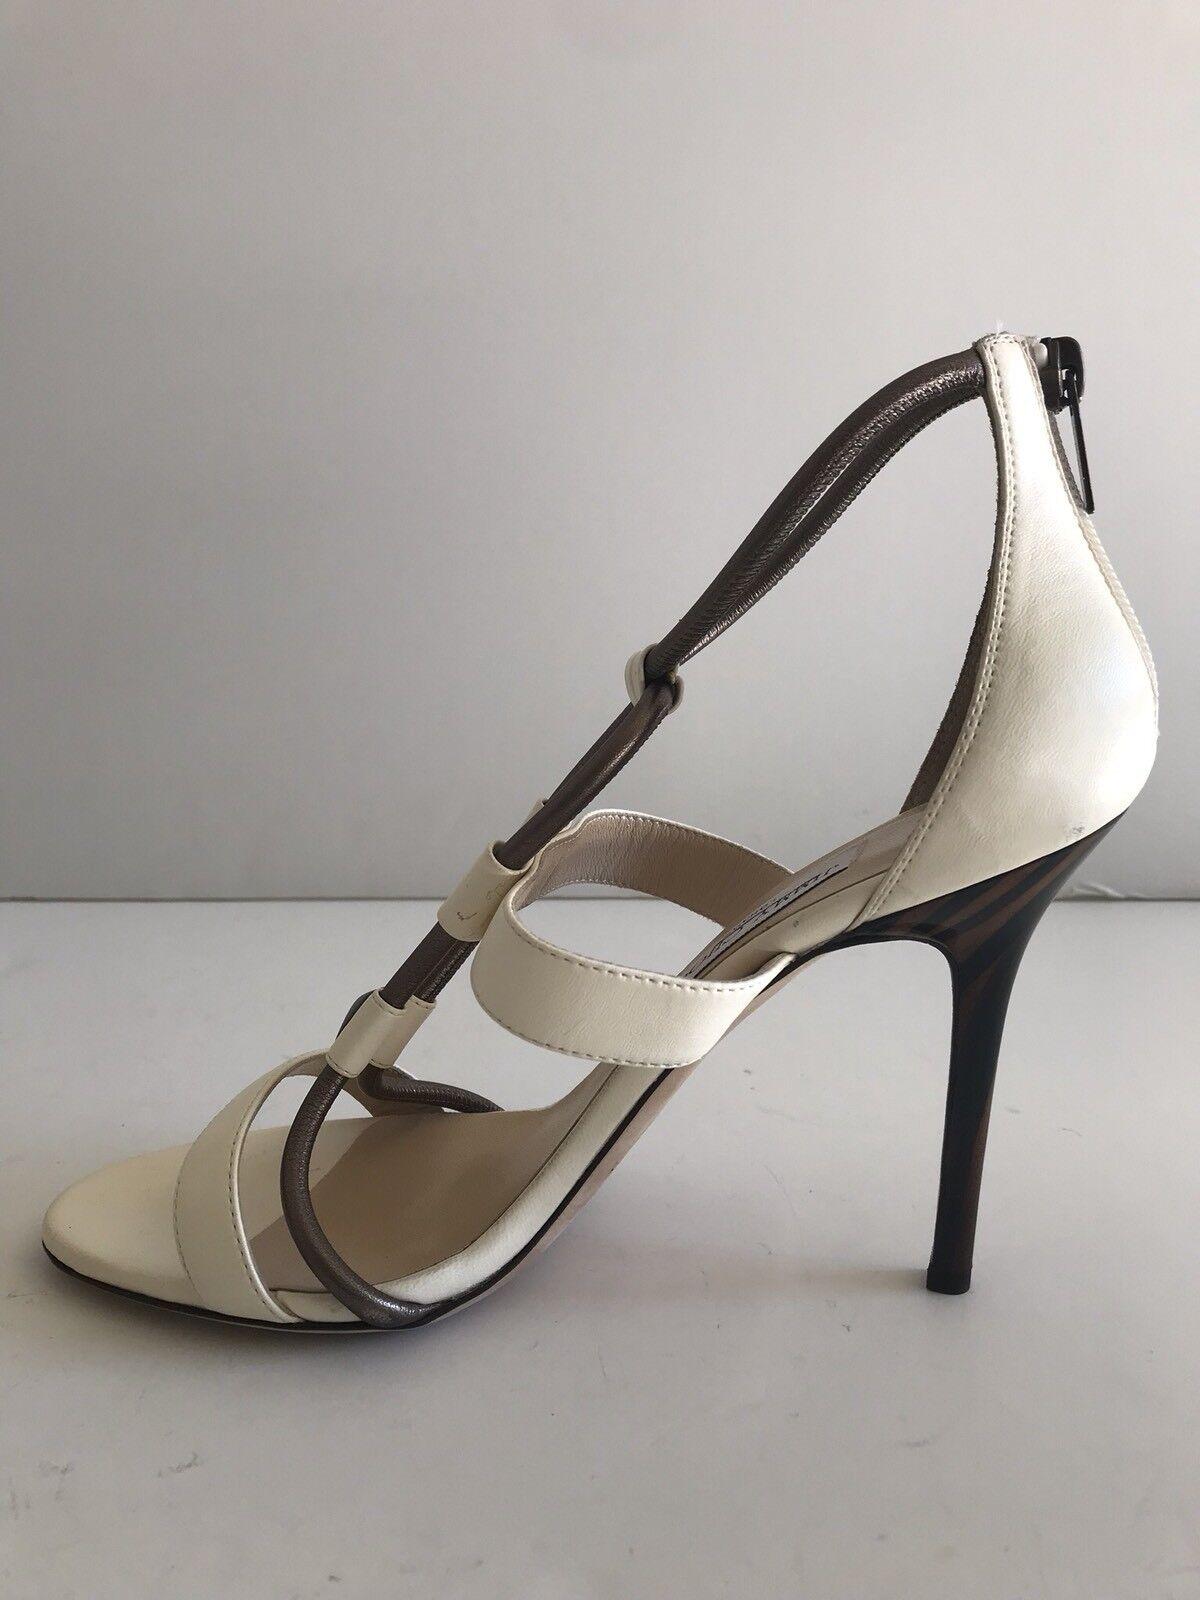 Jimmy Choo Venus Stud-Front T-Strap Sandal Size 10.5US 40.5EUR 40.5EUR 40.5EUR MSRP  995 b1d6da